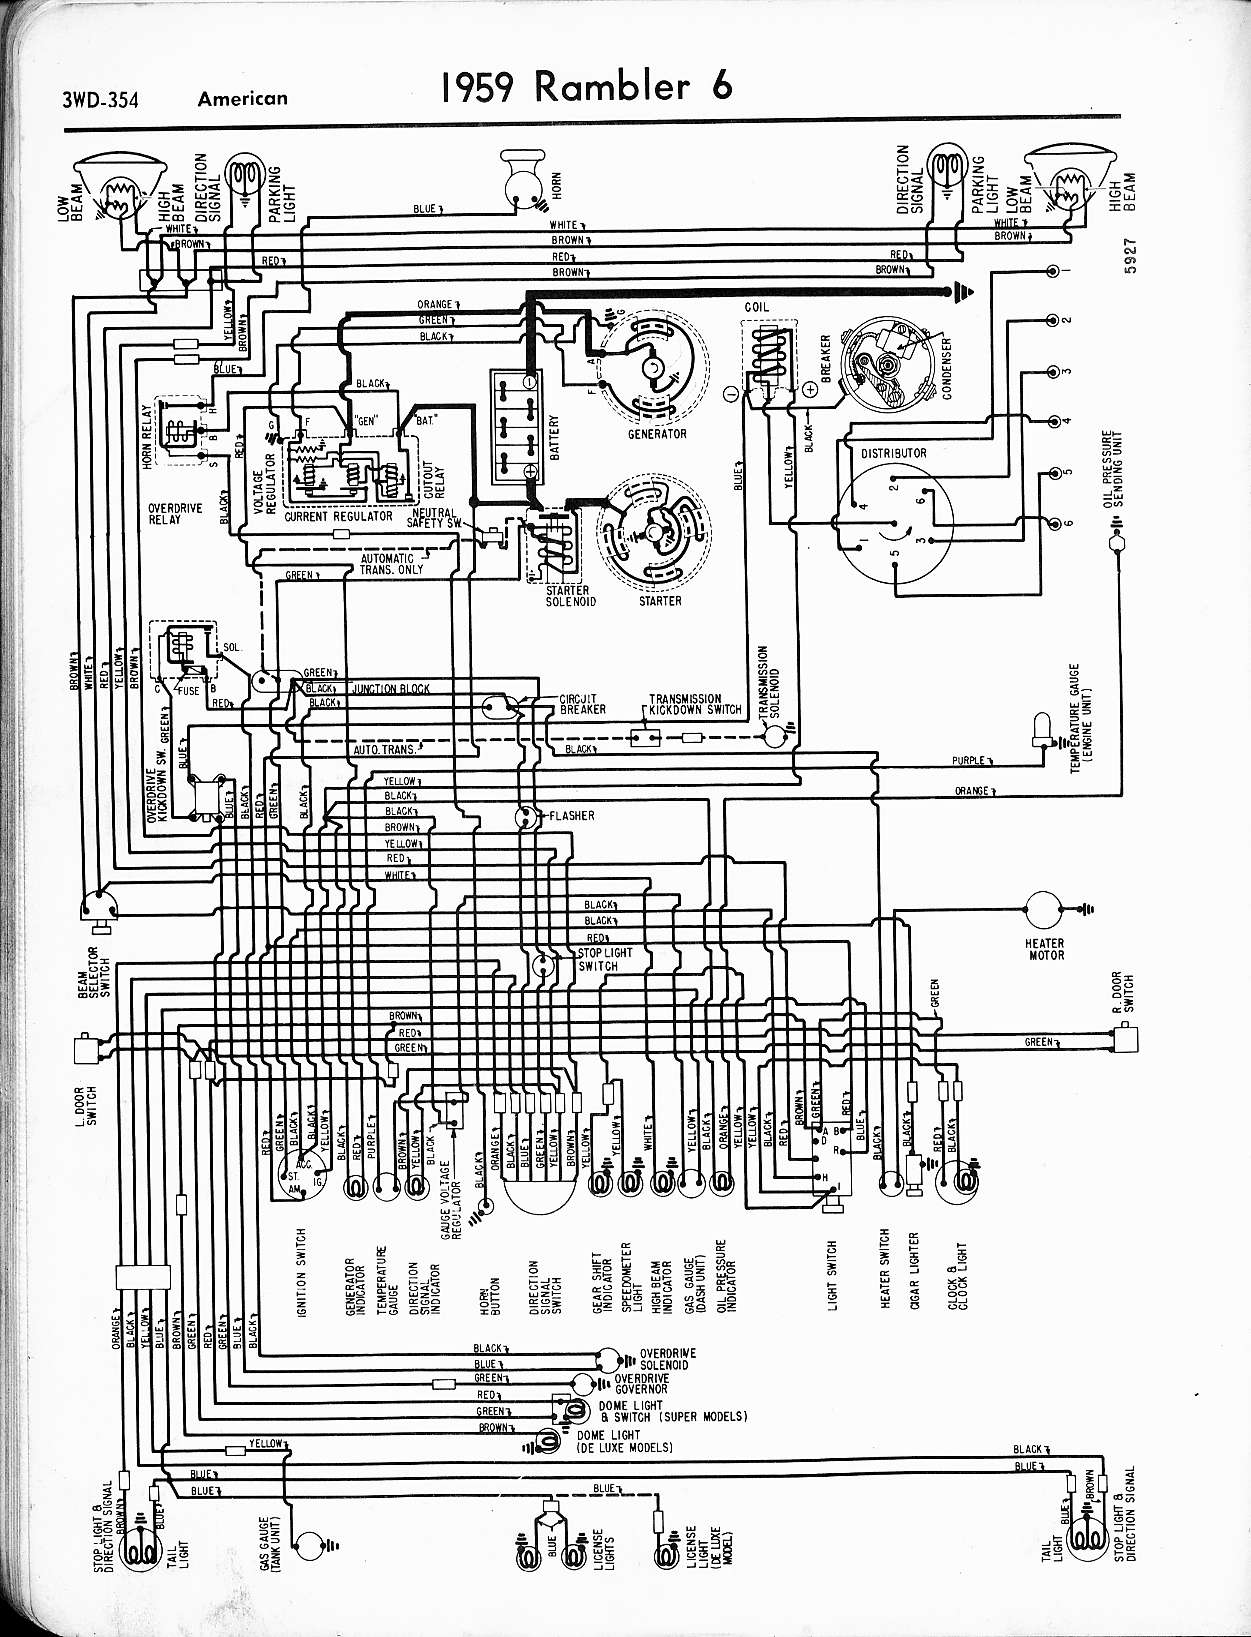 ac wiring diagram symbols of ceiling fan with light old all data car cub cadet